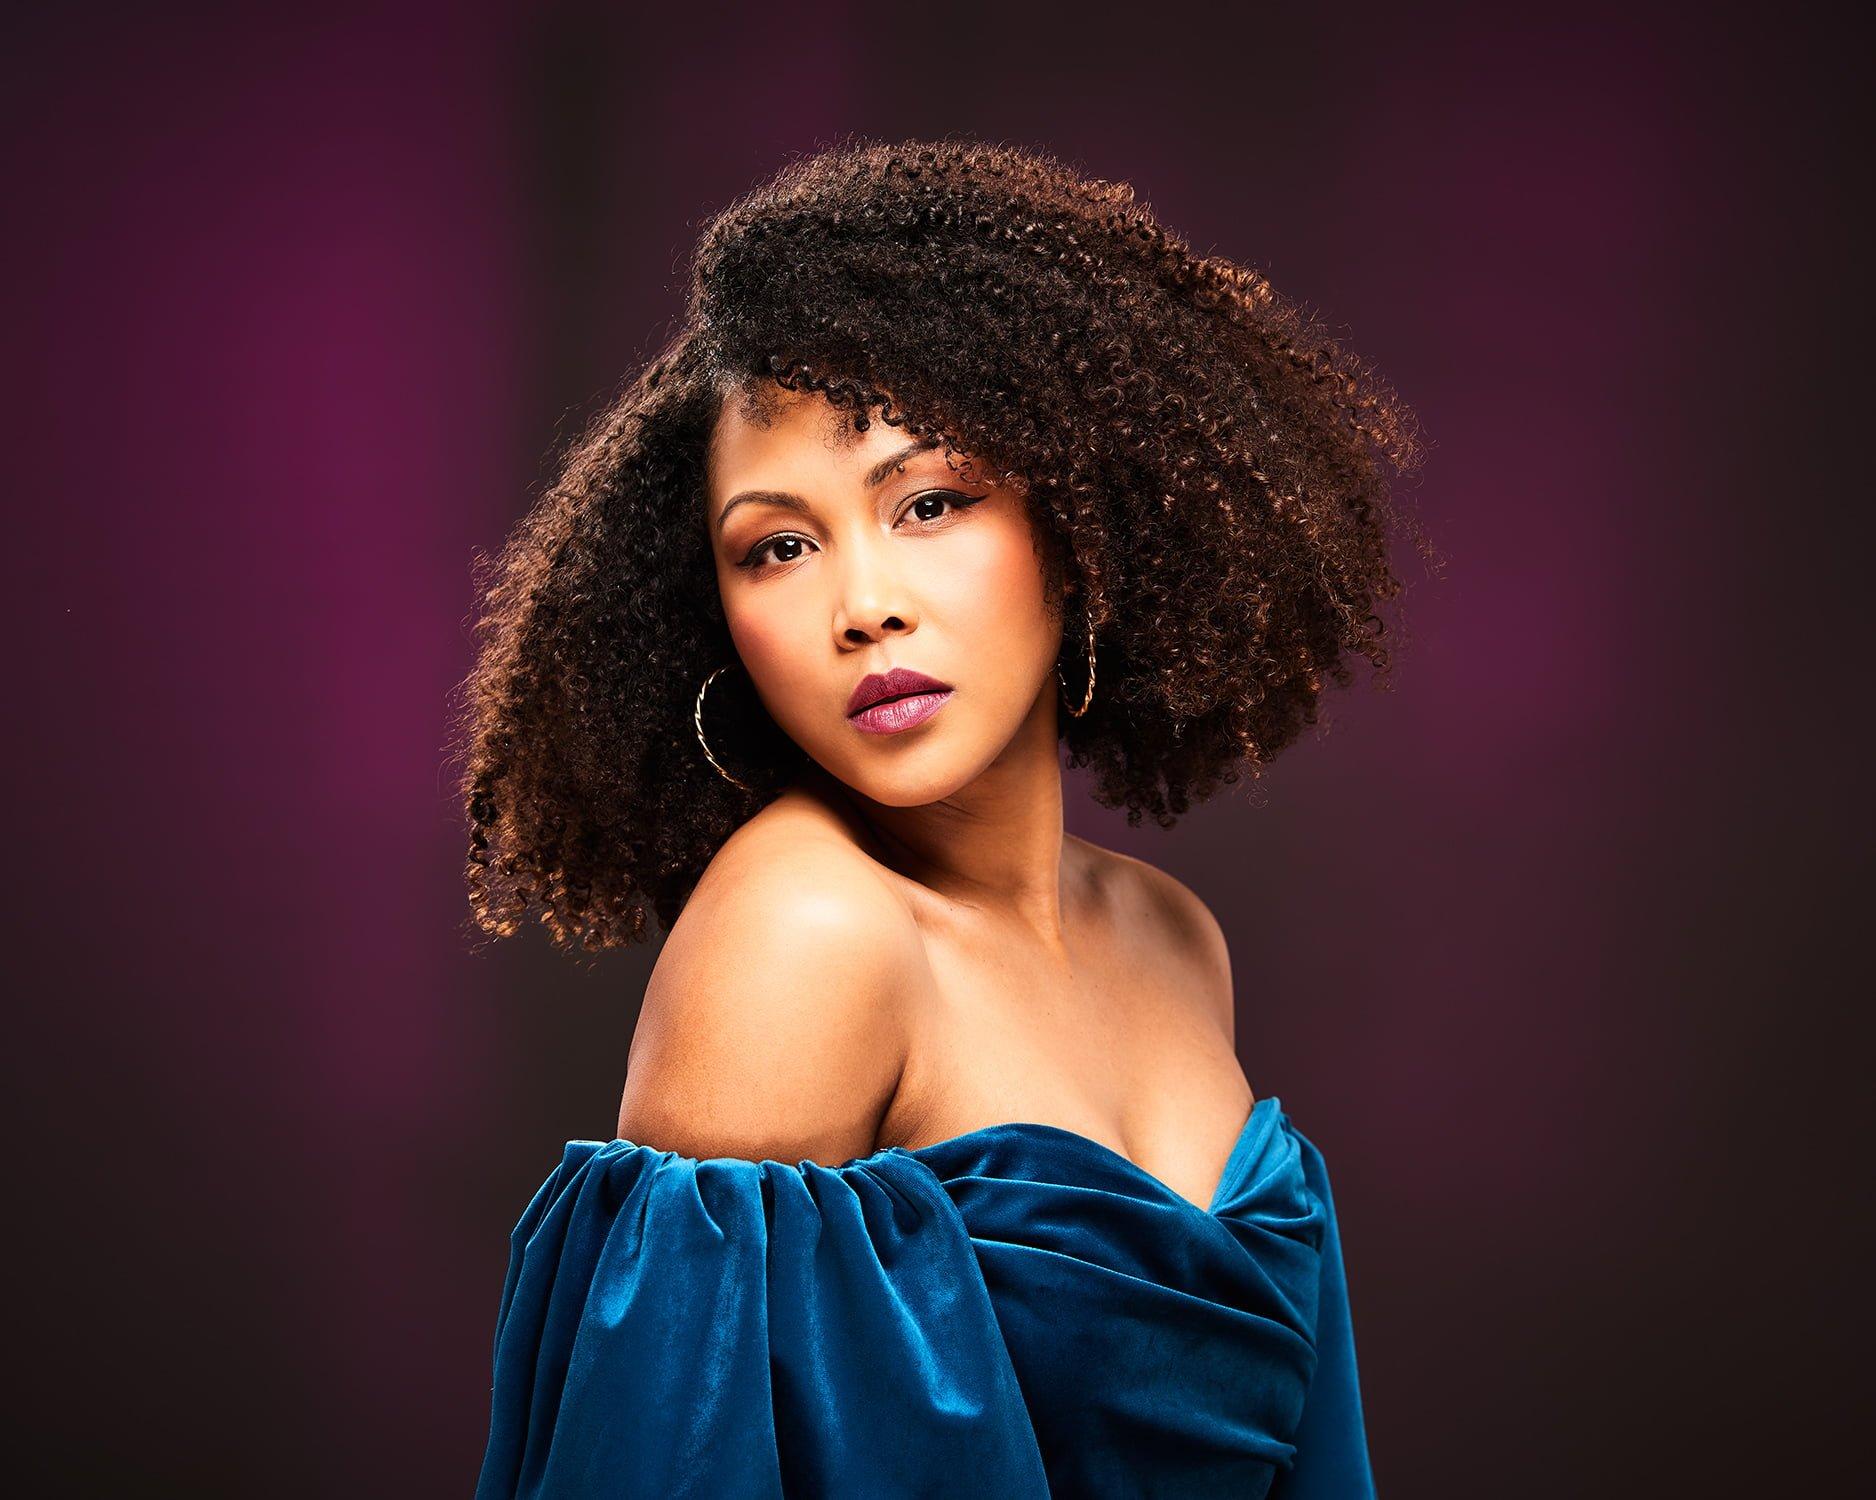 portrait of female singer brighton photographer